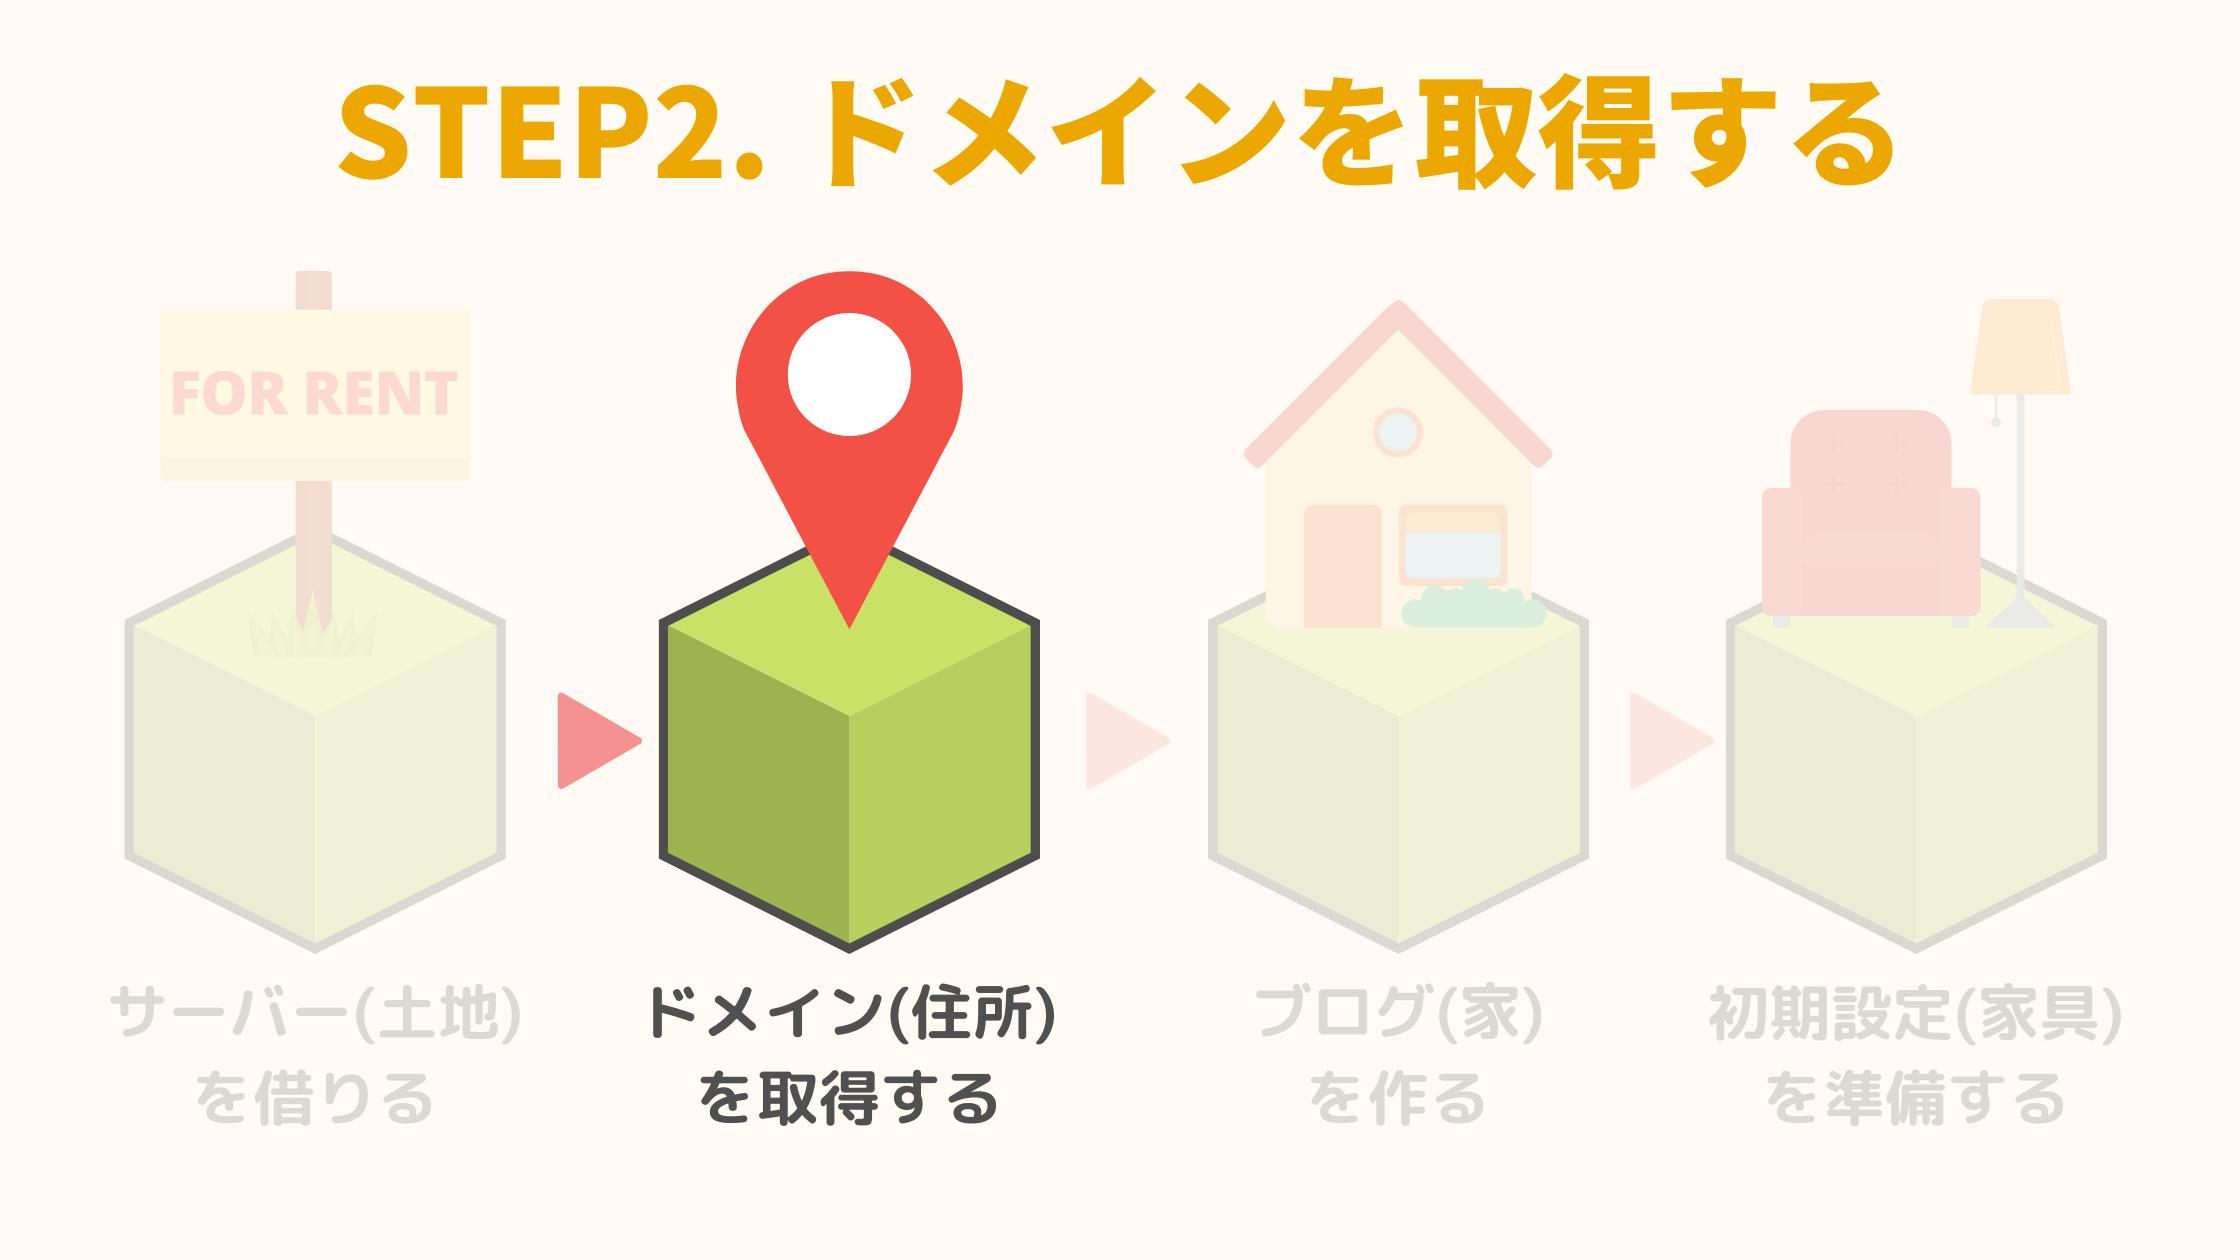 STEP2. ドメインを取得する